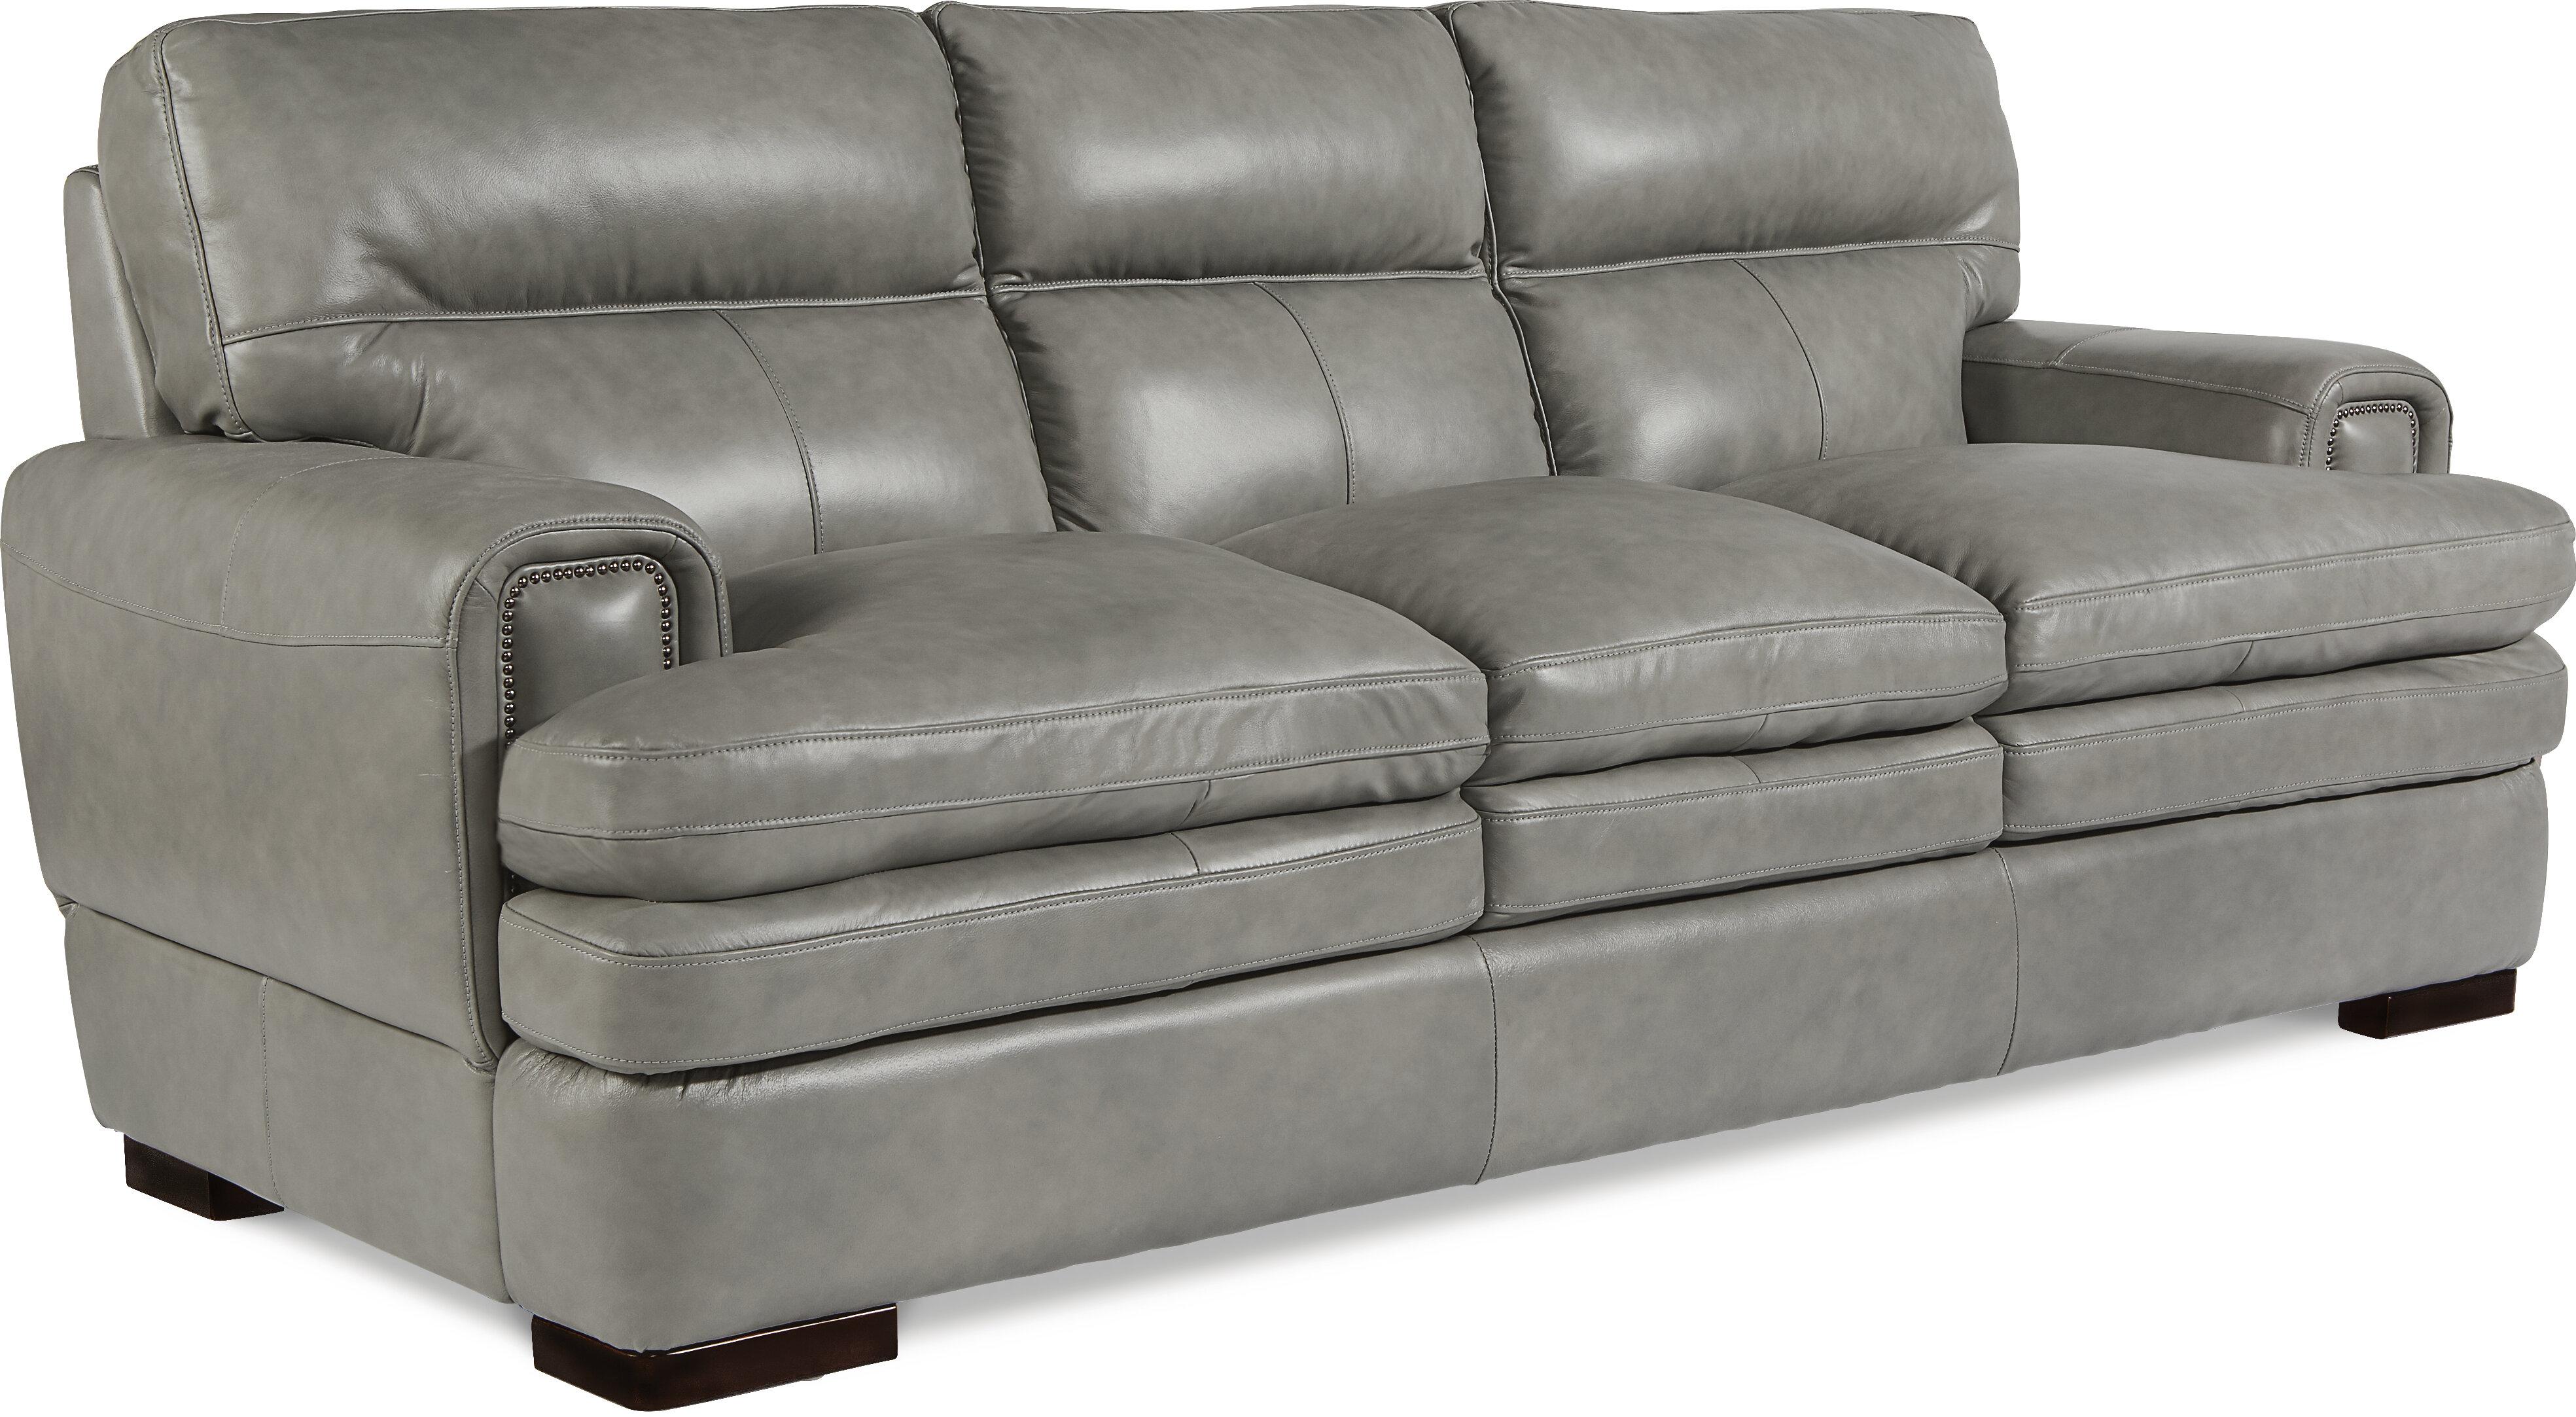 sofa lazy boy – Home and Textiles